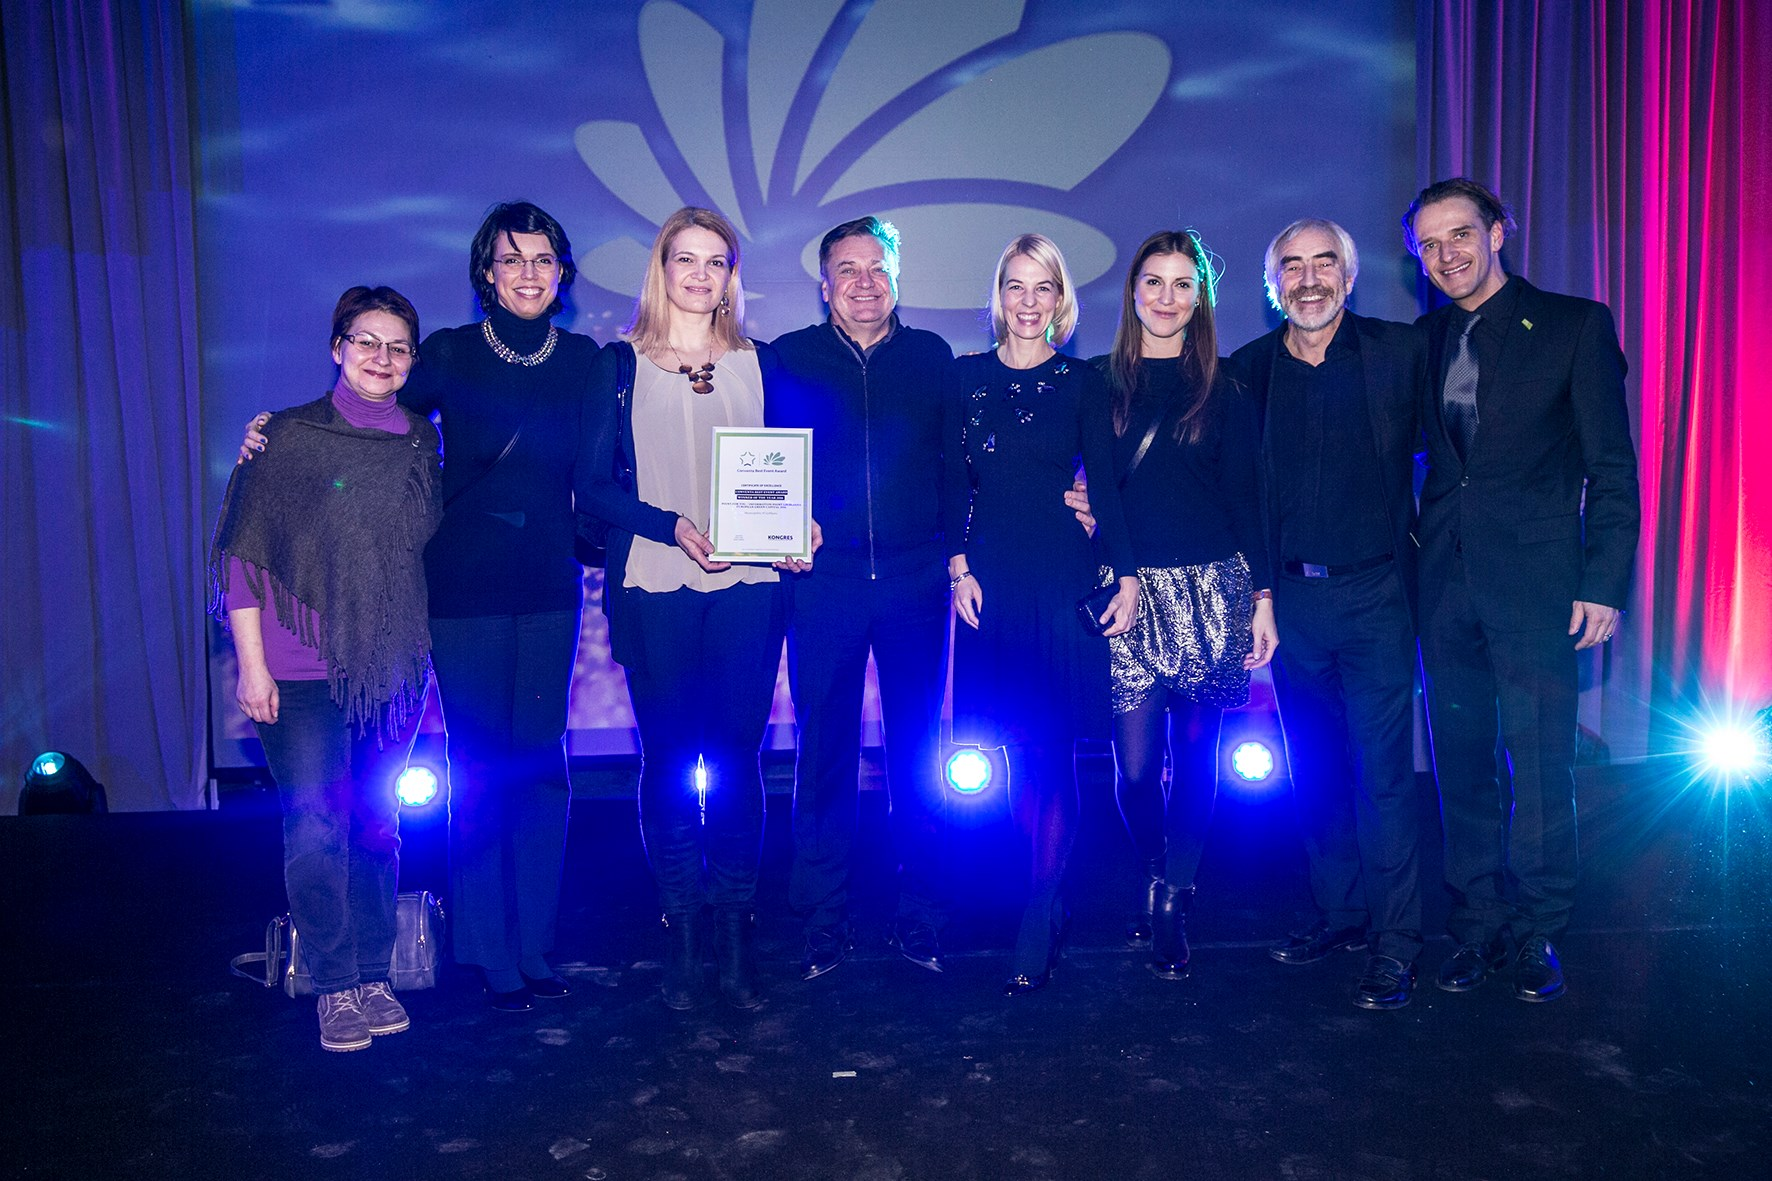 The Conventa best event award 2016 » City of Ljubljana